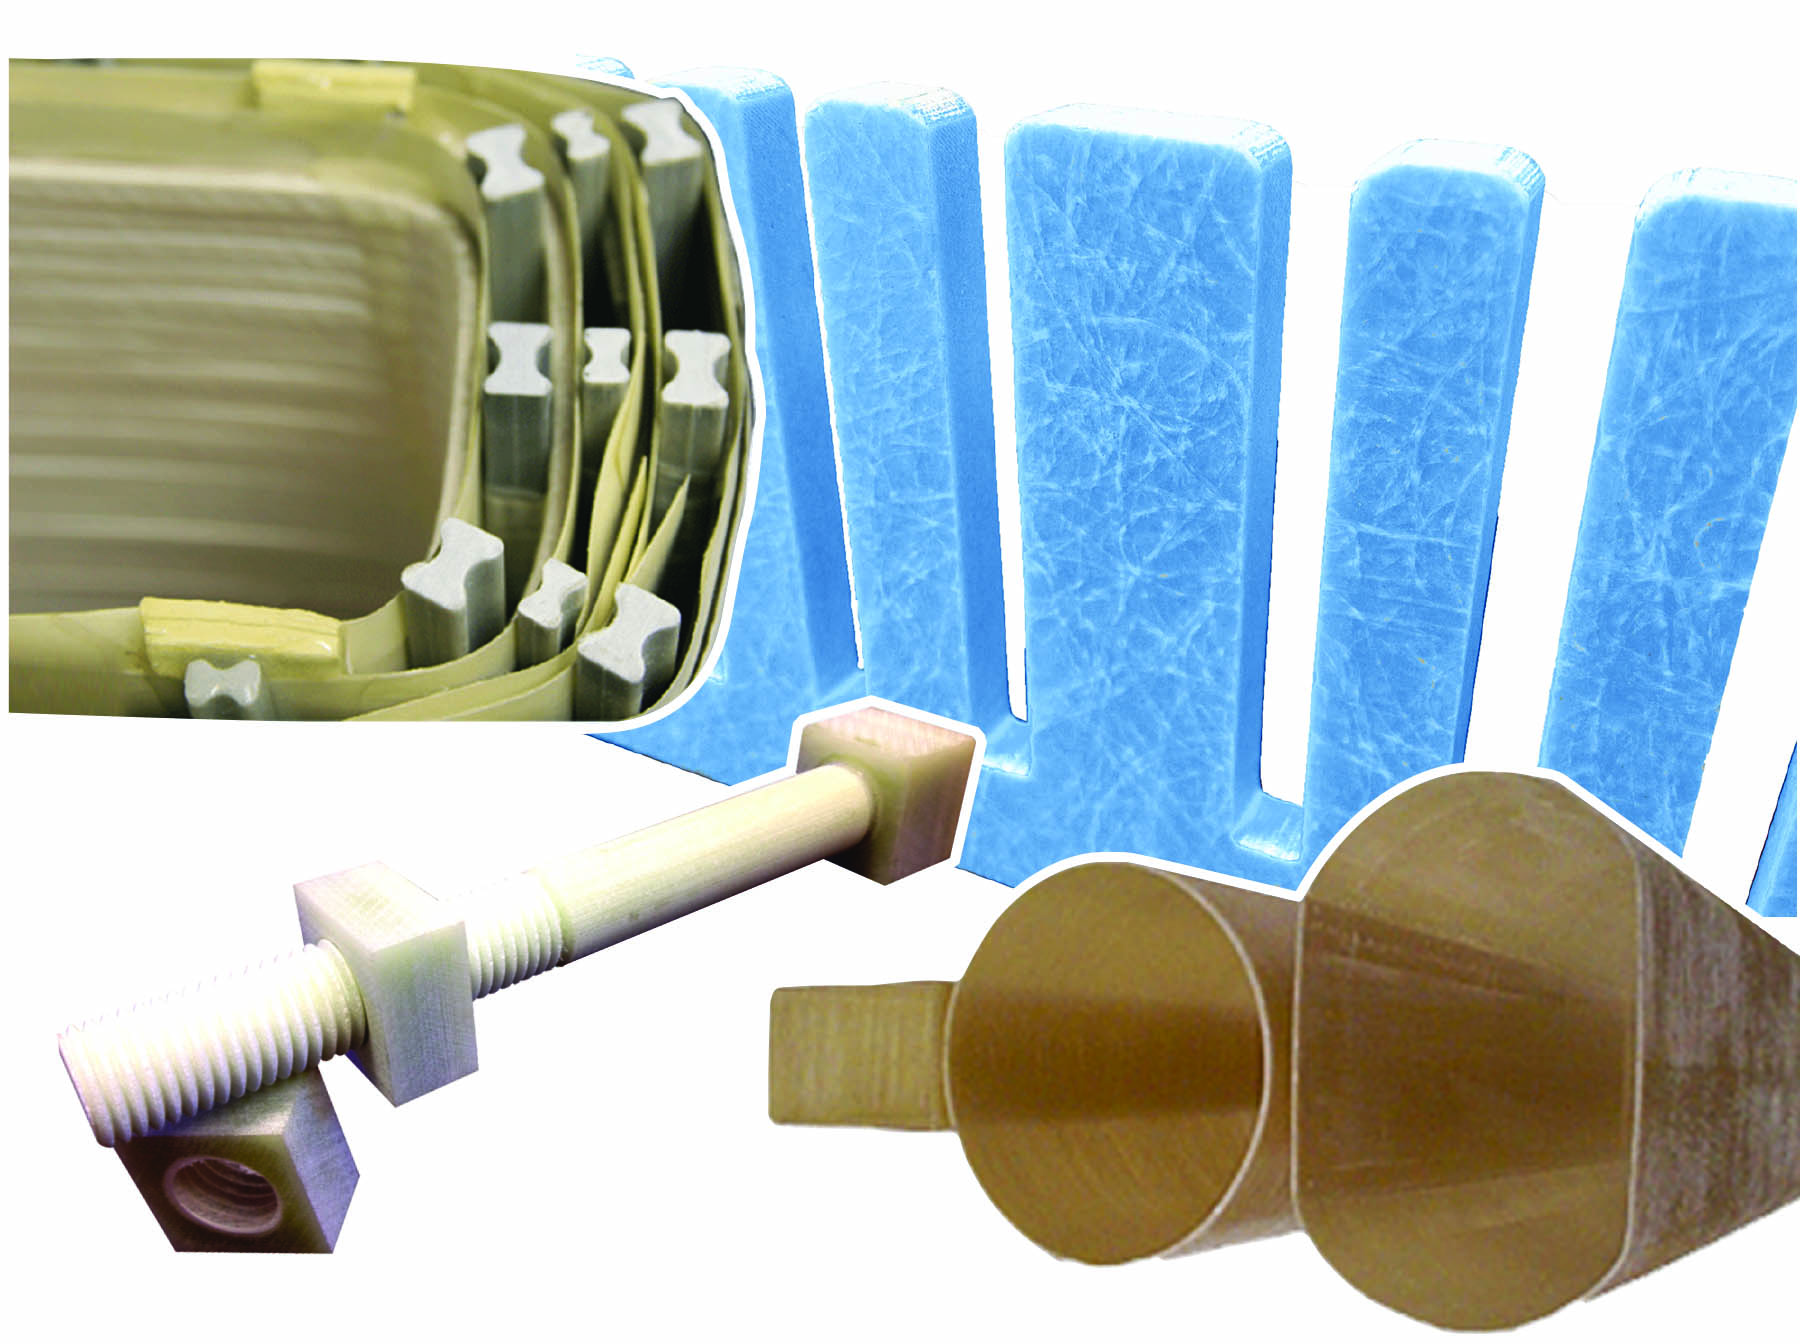 Transformer Applications The Gund Company